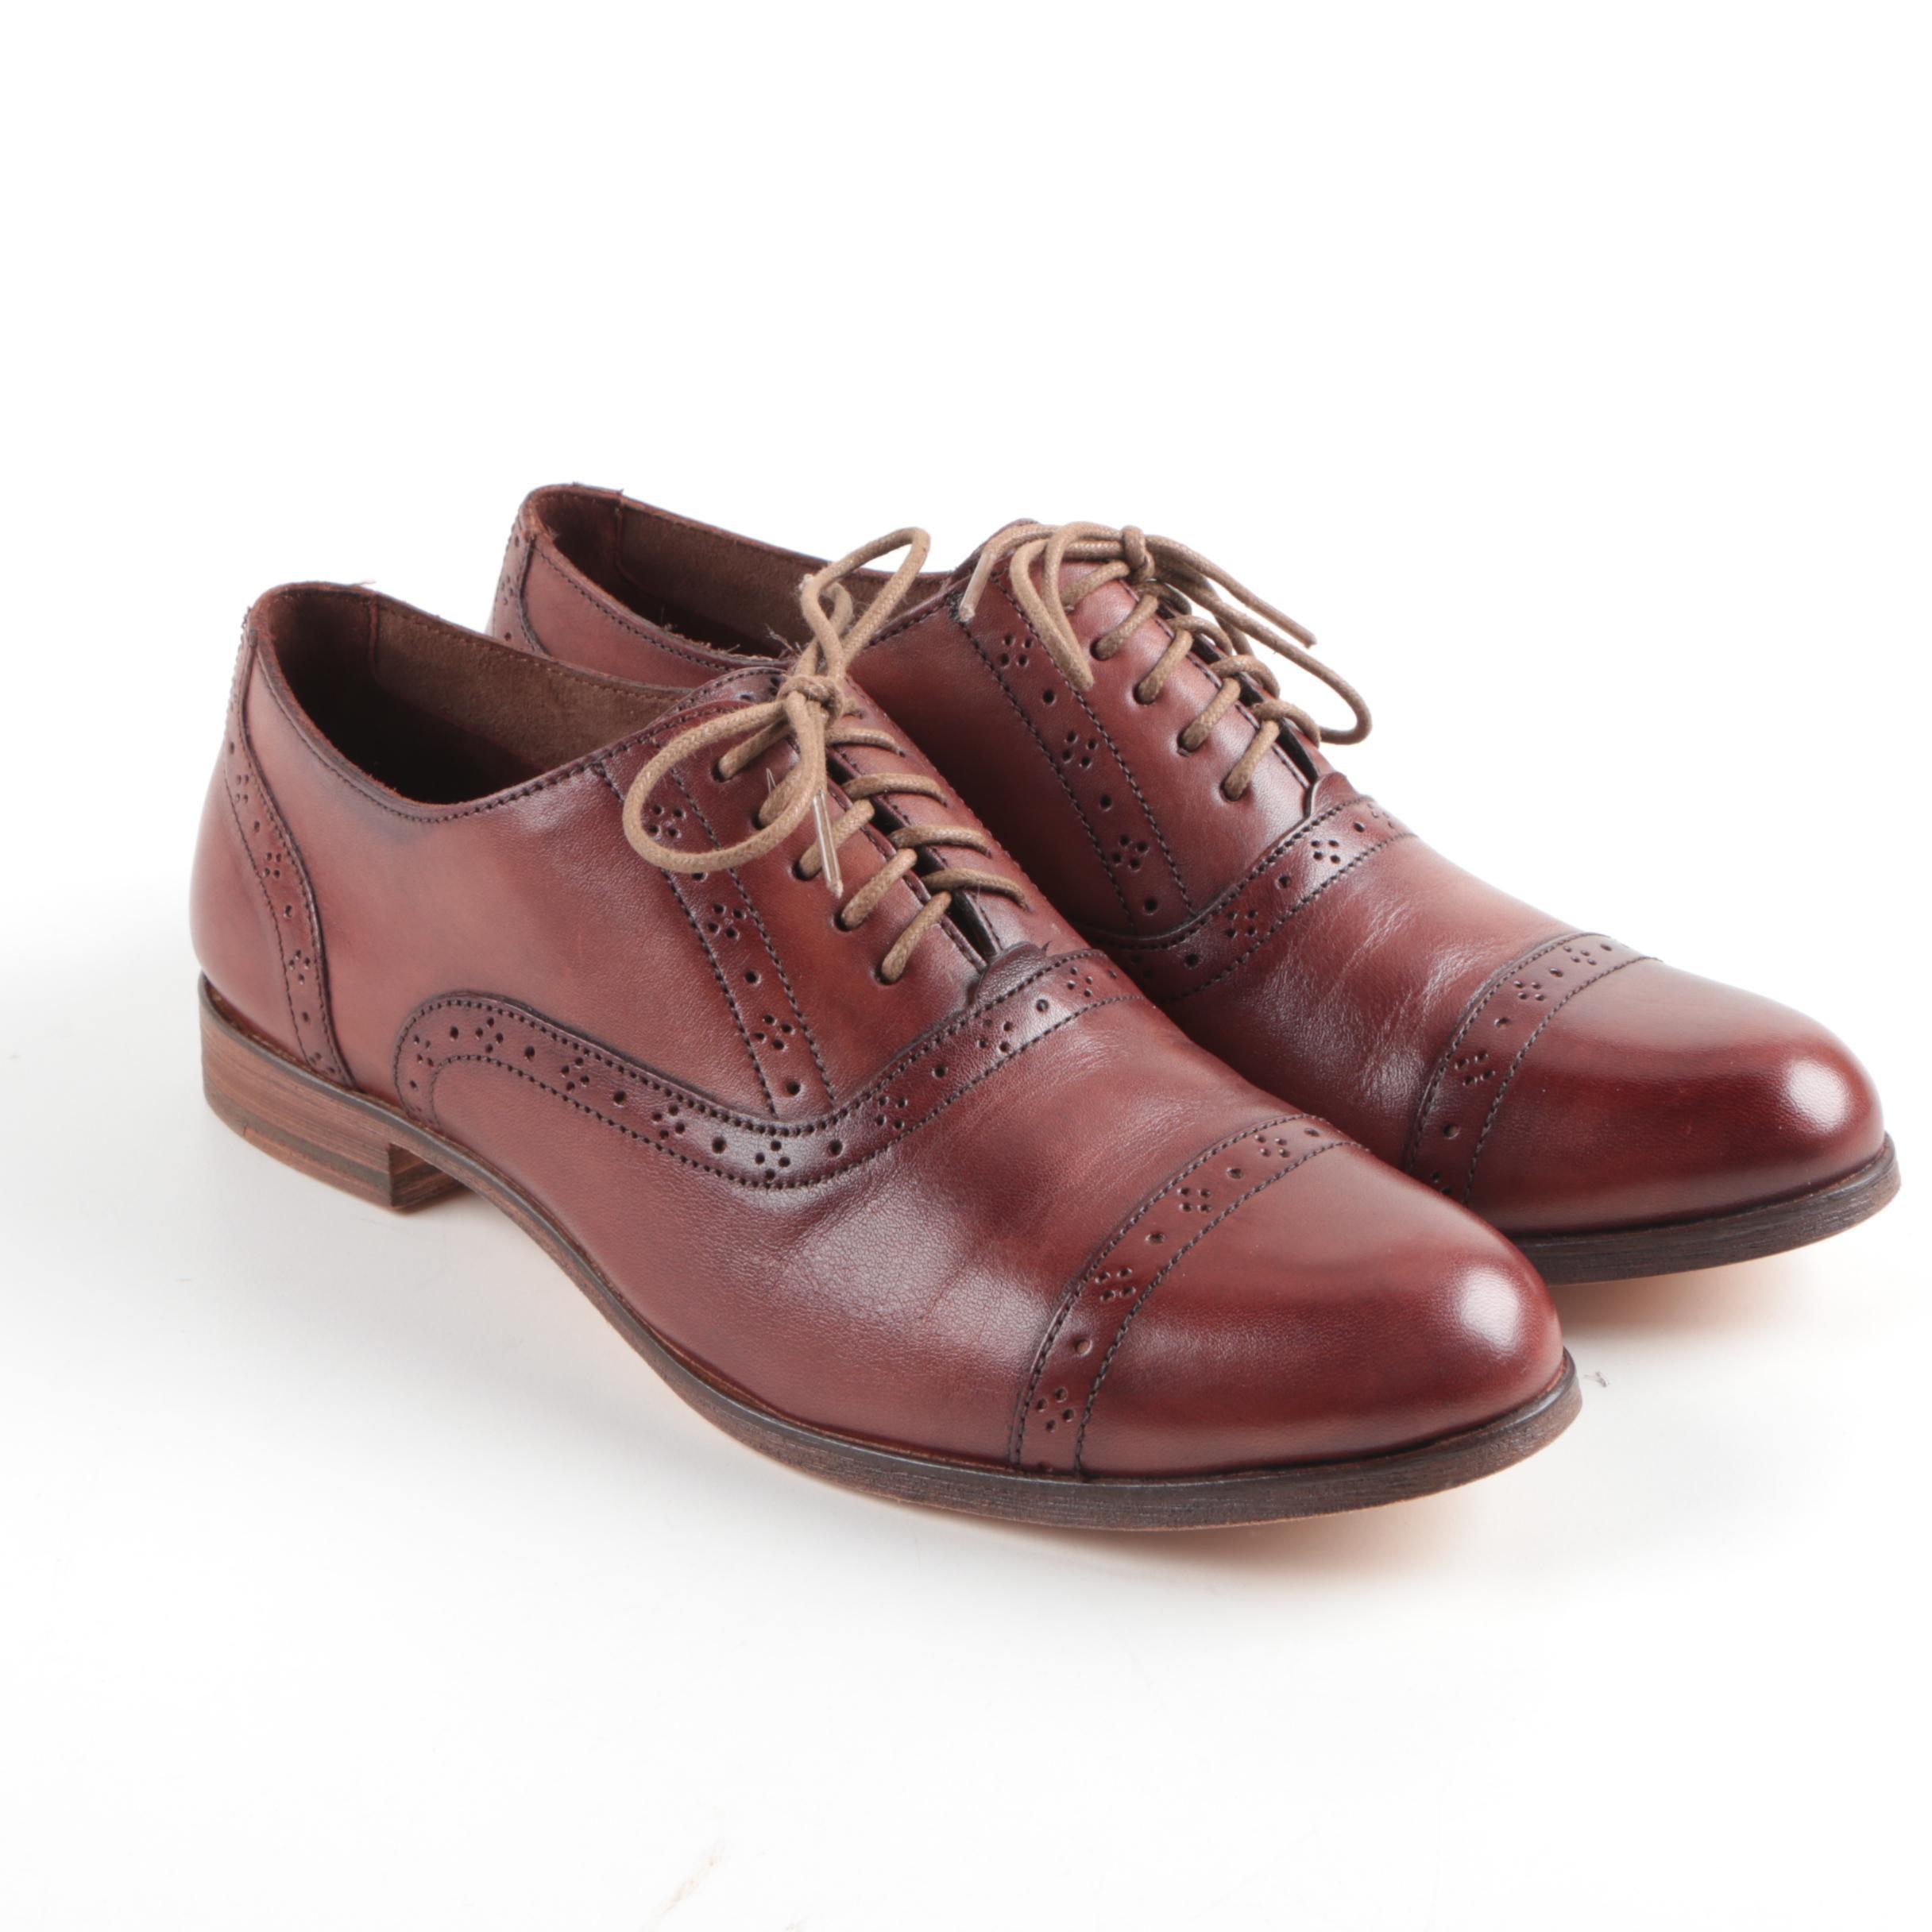 Men's Cole Haan Brown Leather Cap Toe Oxfords